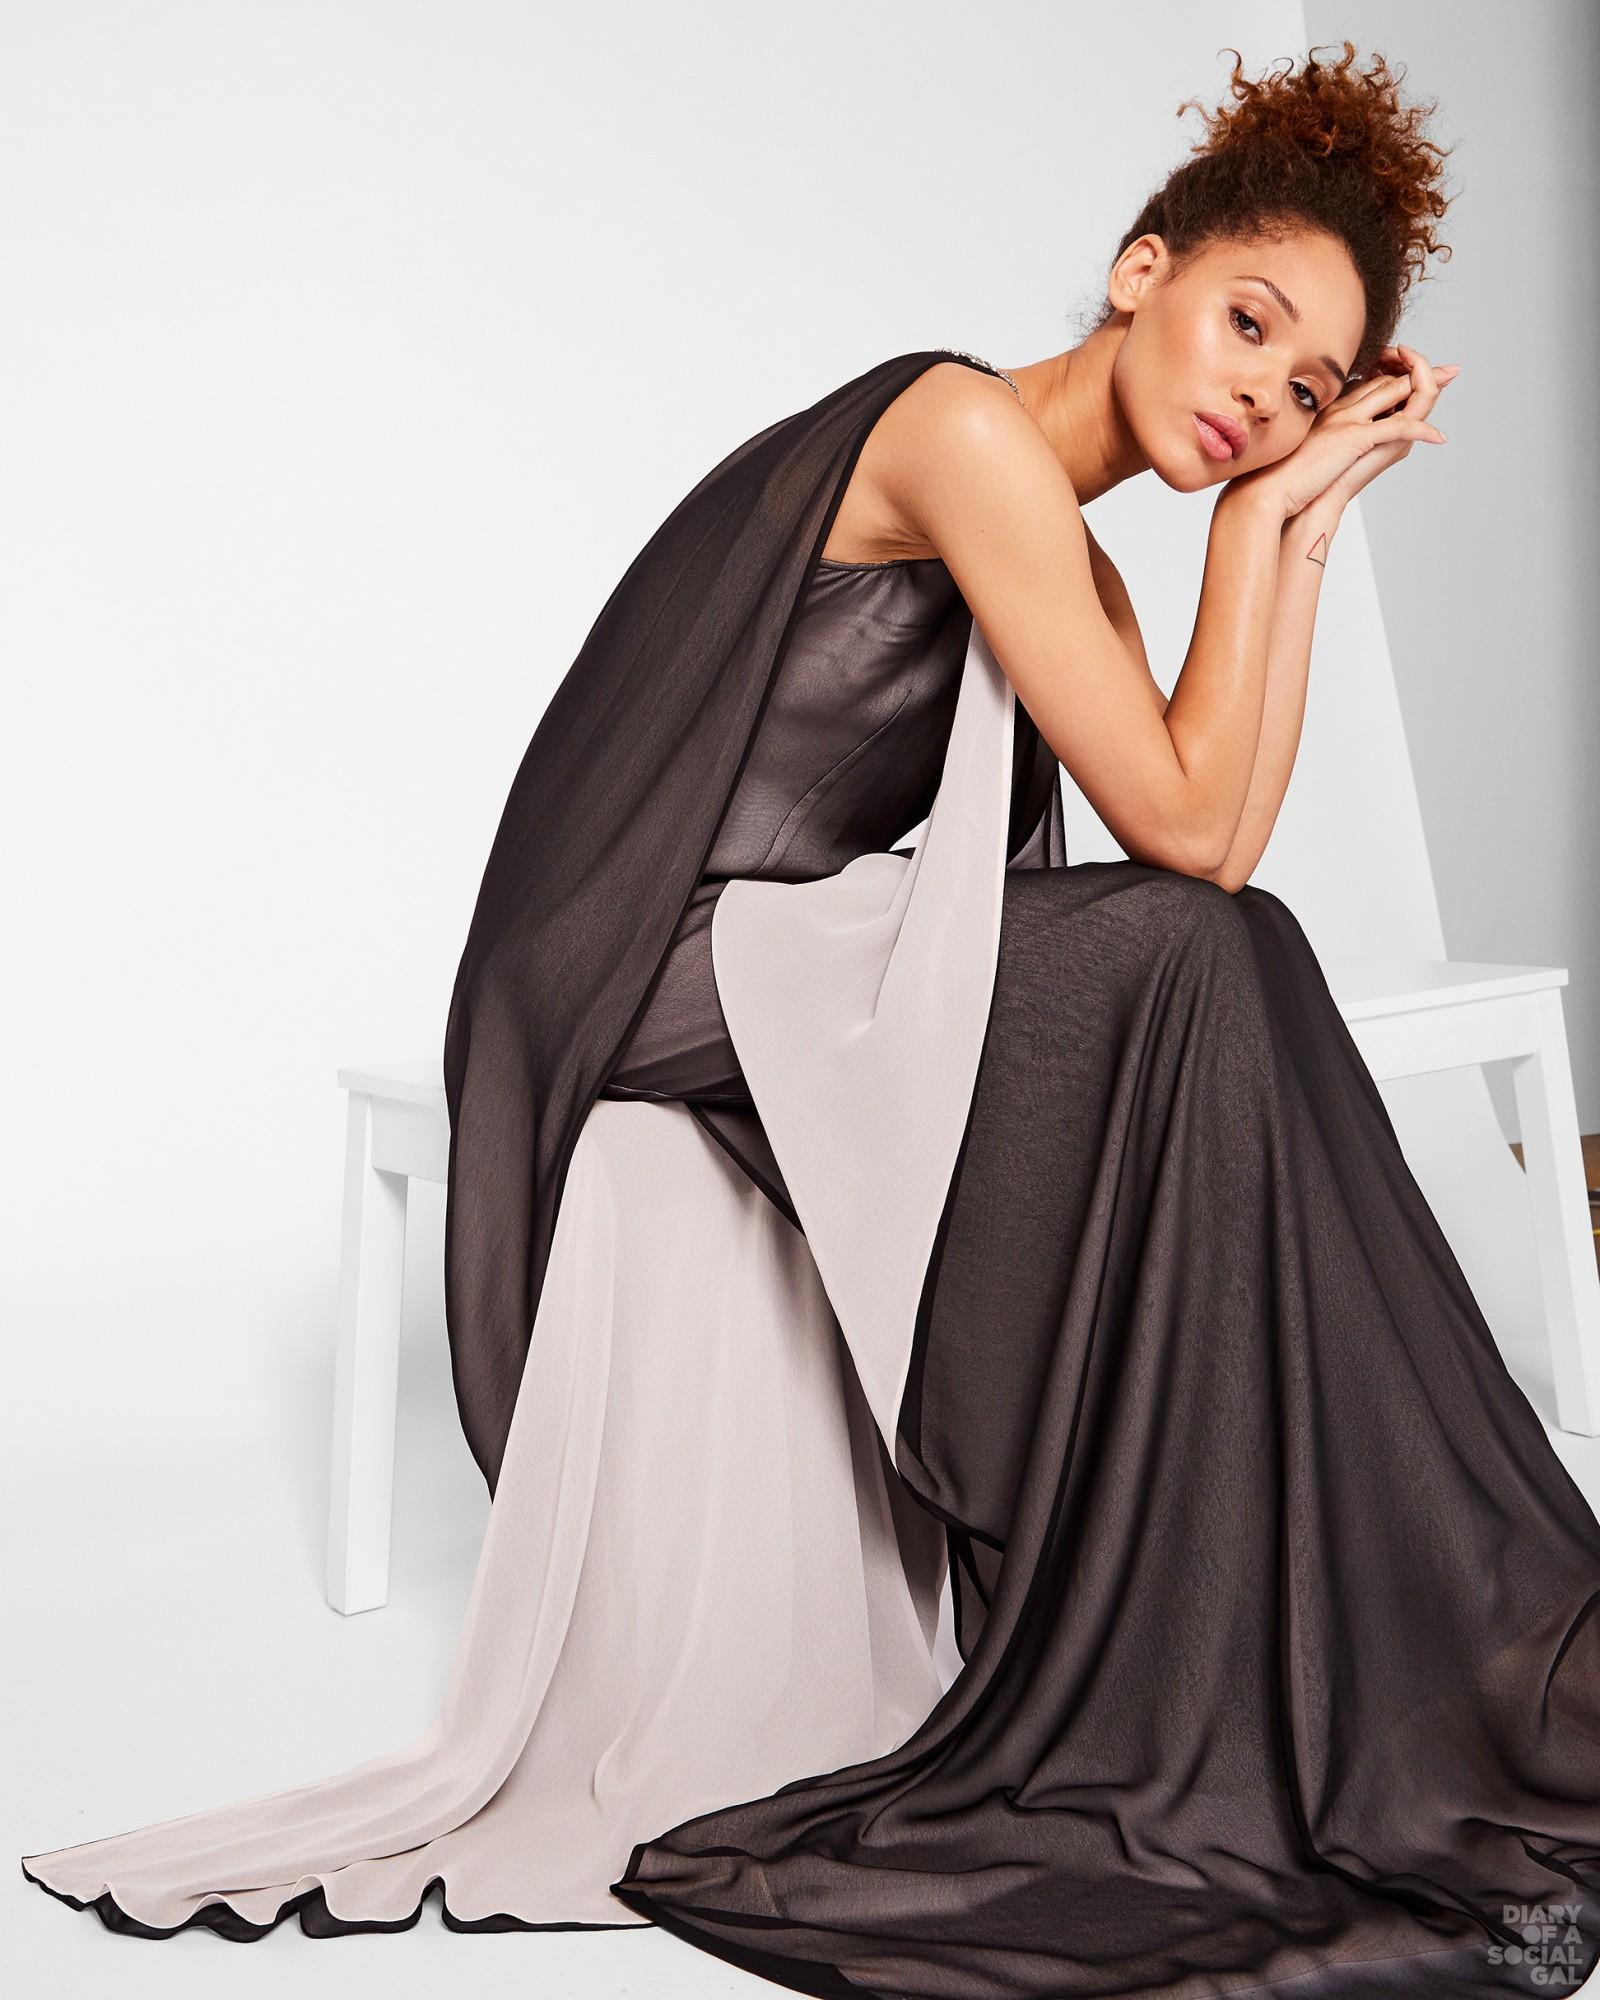 uk-Womens-Clothing-Dresses-ISHANI-Embellished-two-tone-maxi-dress-Black-WA7W_ISHANI_BLACK_1.jpg